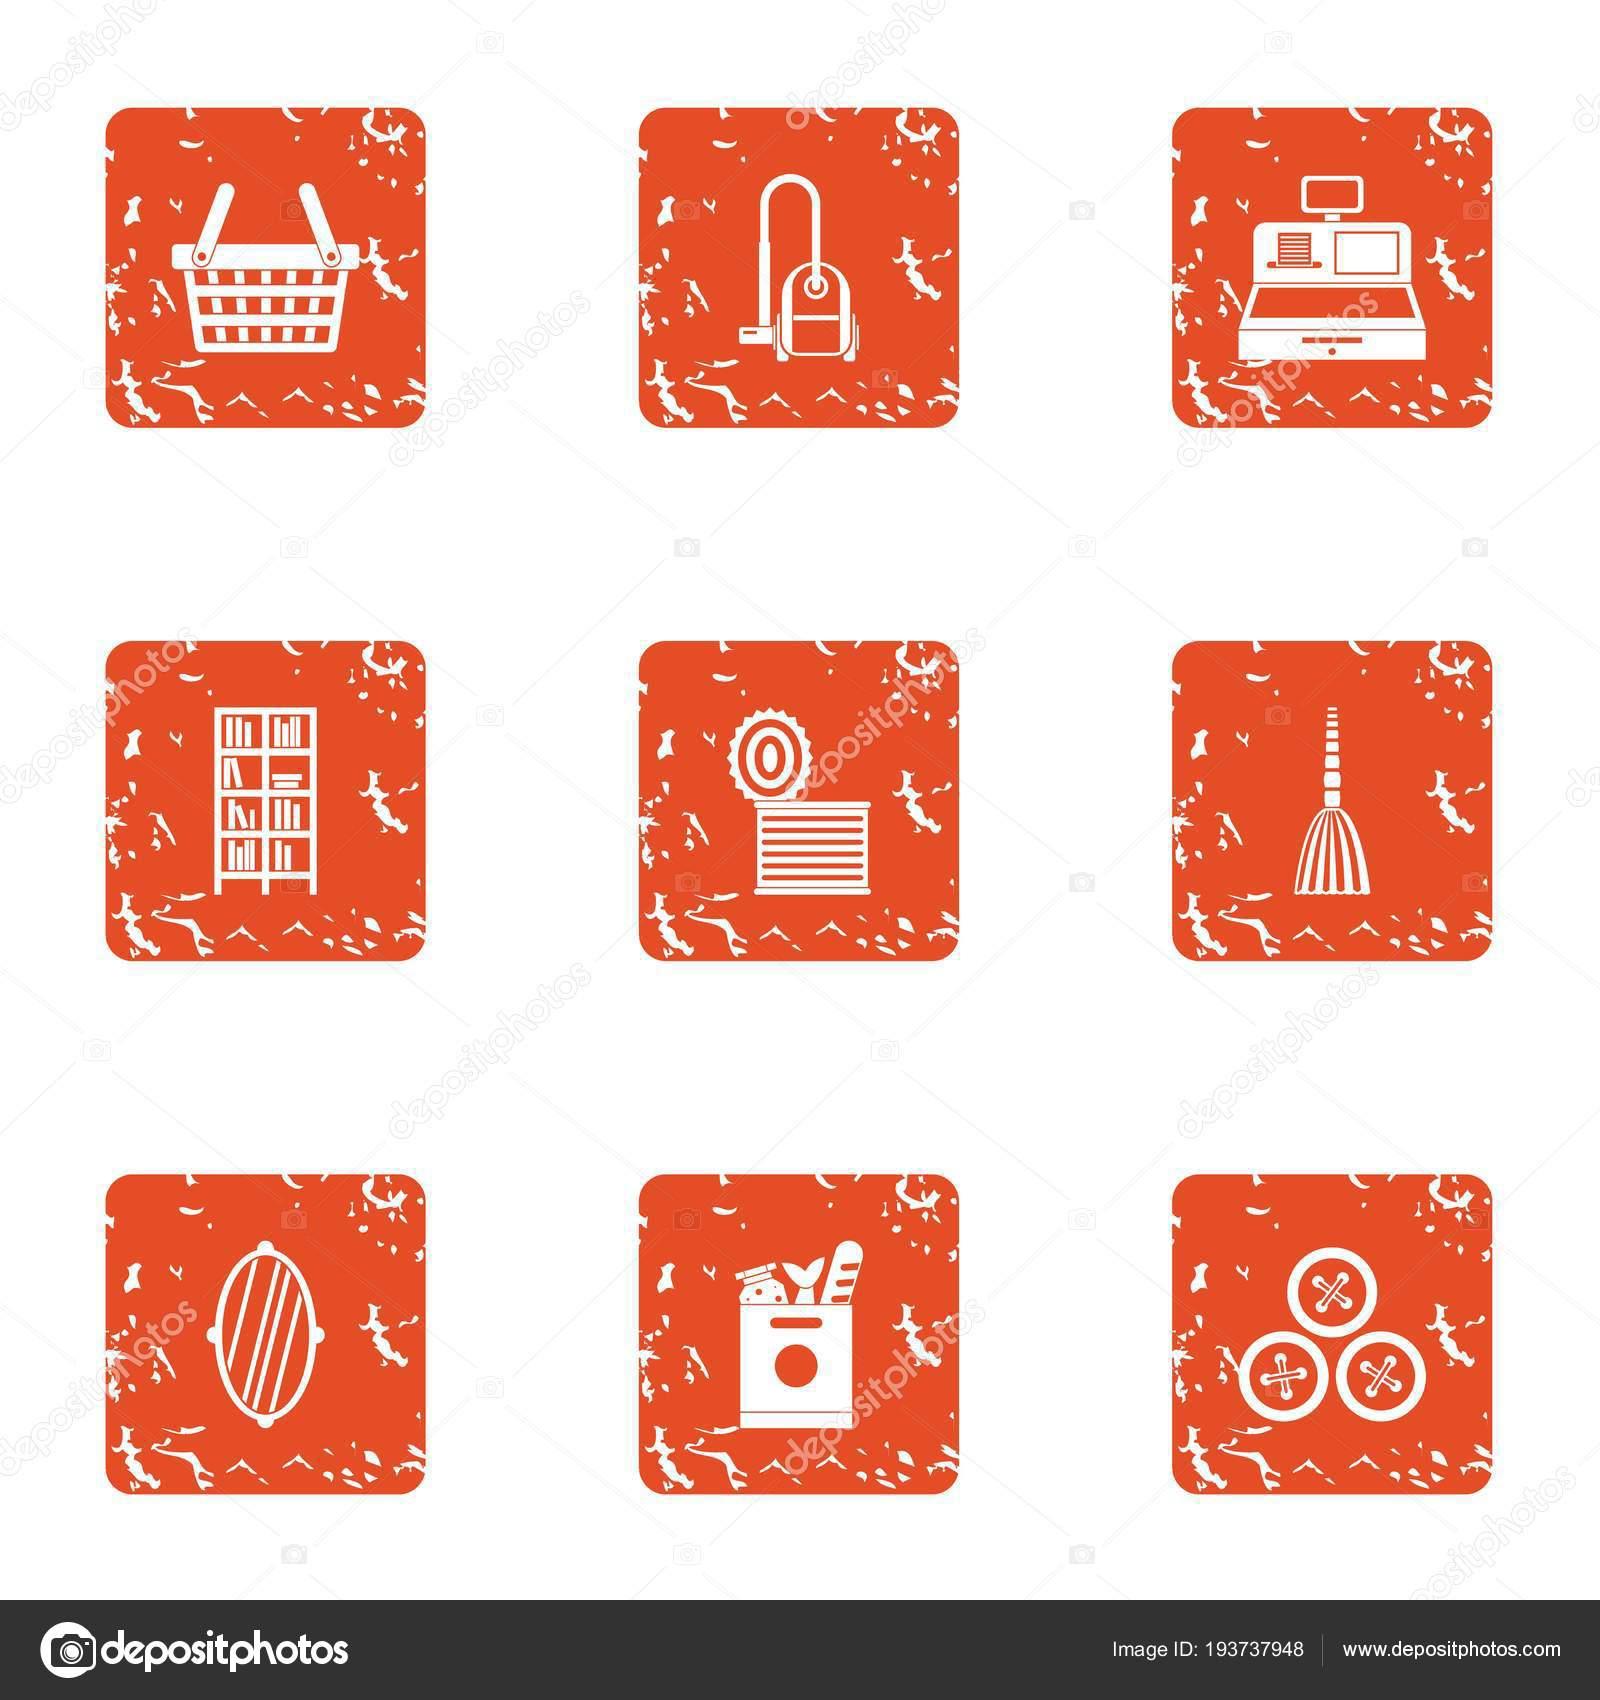 kitchens store chinese kitchen accessories 厨房商店图标设置 垃圾样式 图库矢量图像 c ylivdesign 193737948 图库矢量图片